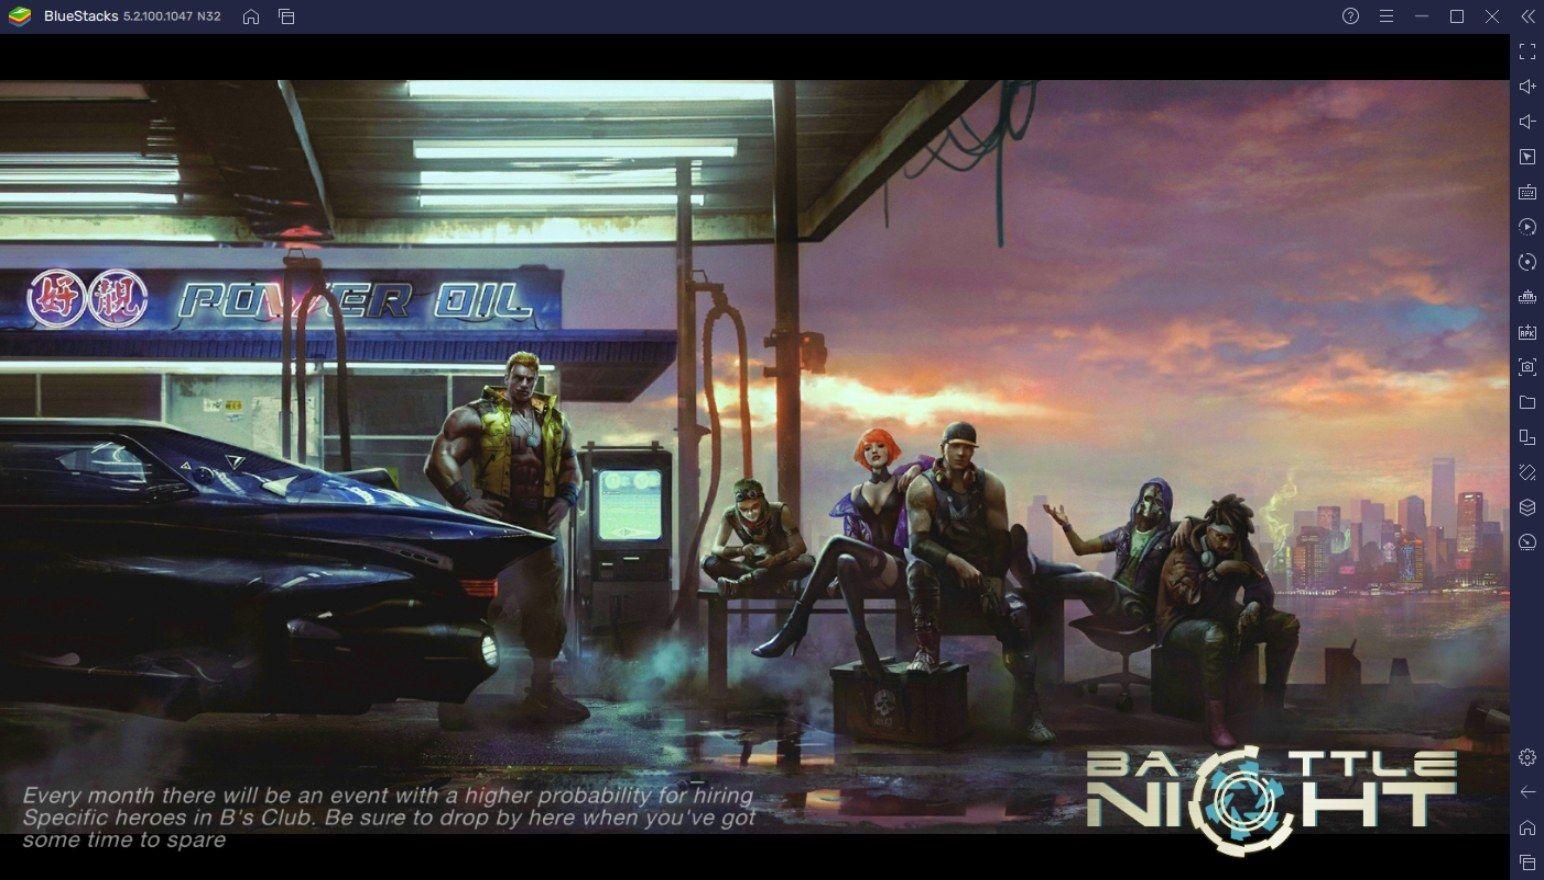 BlueStacks' Leitfaden zu Helden in Battle Night: Cyberpunk-Idle RPG